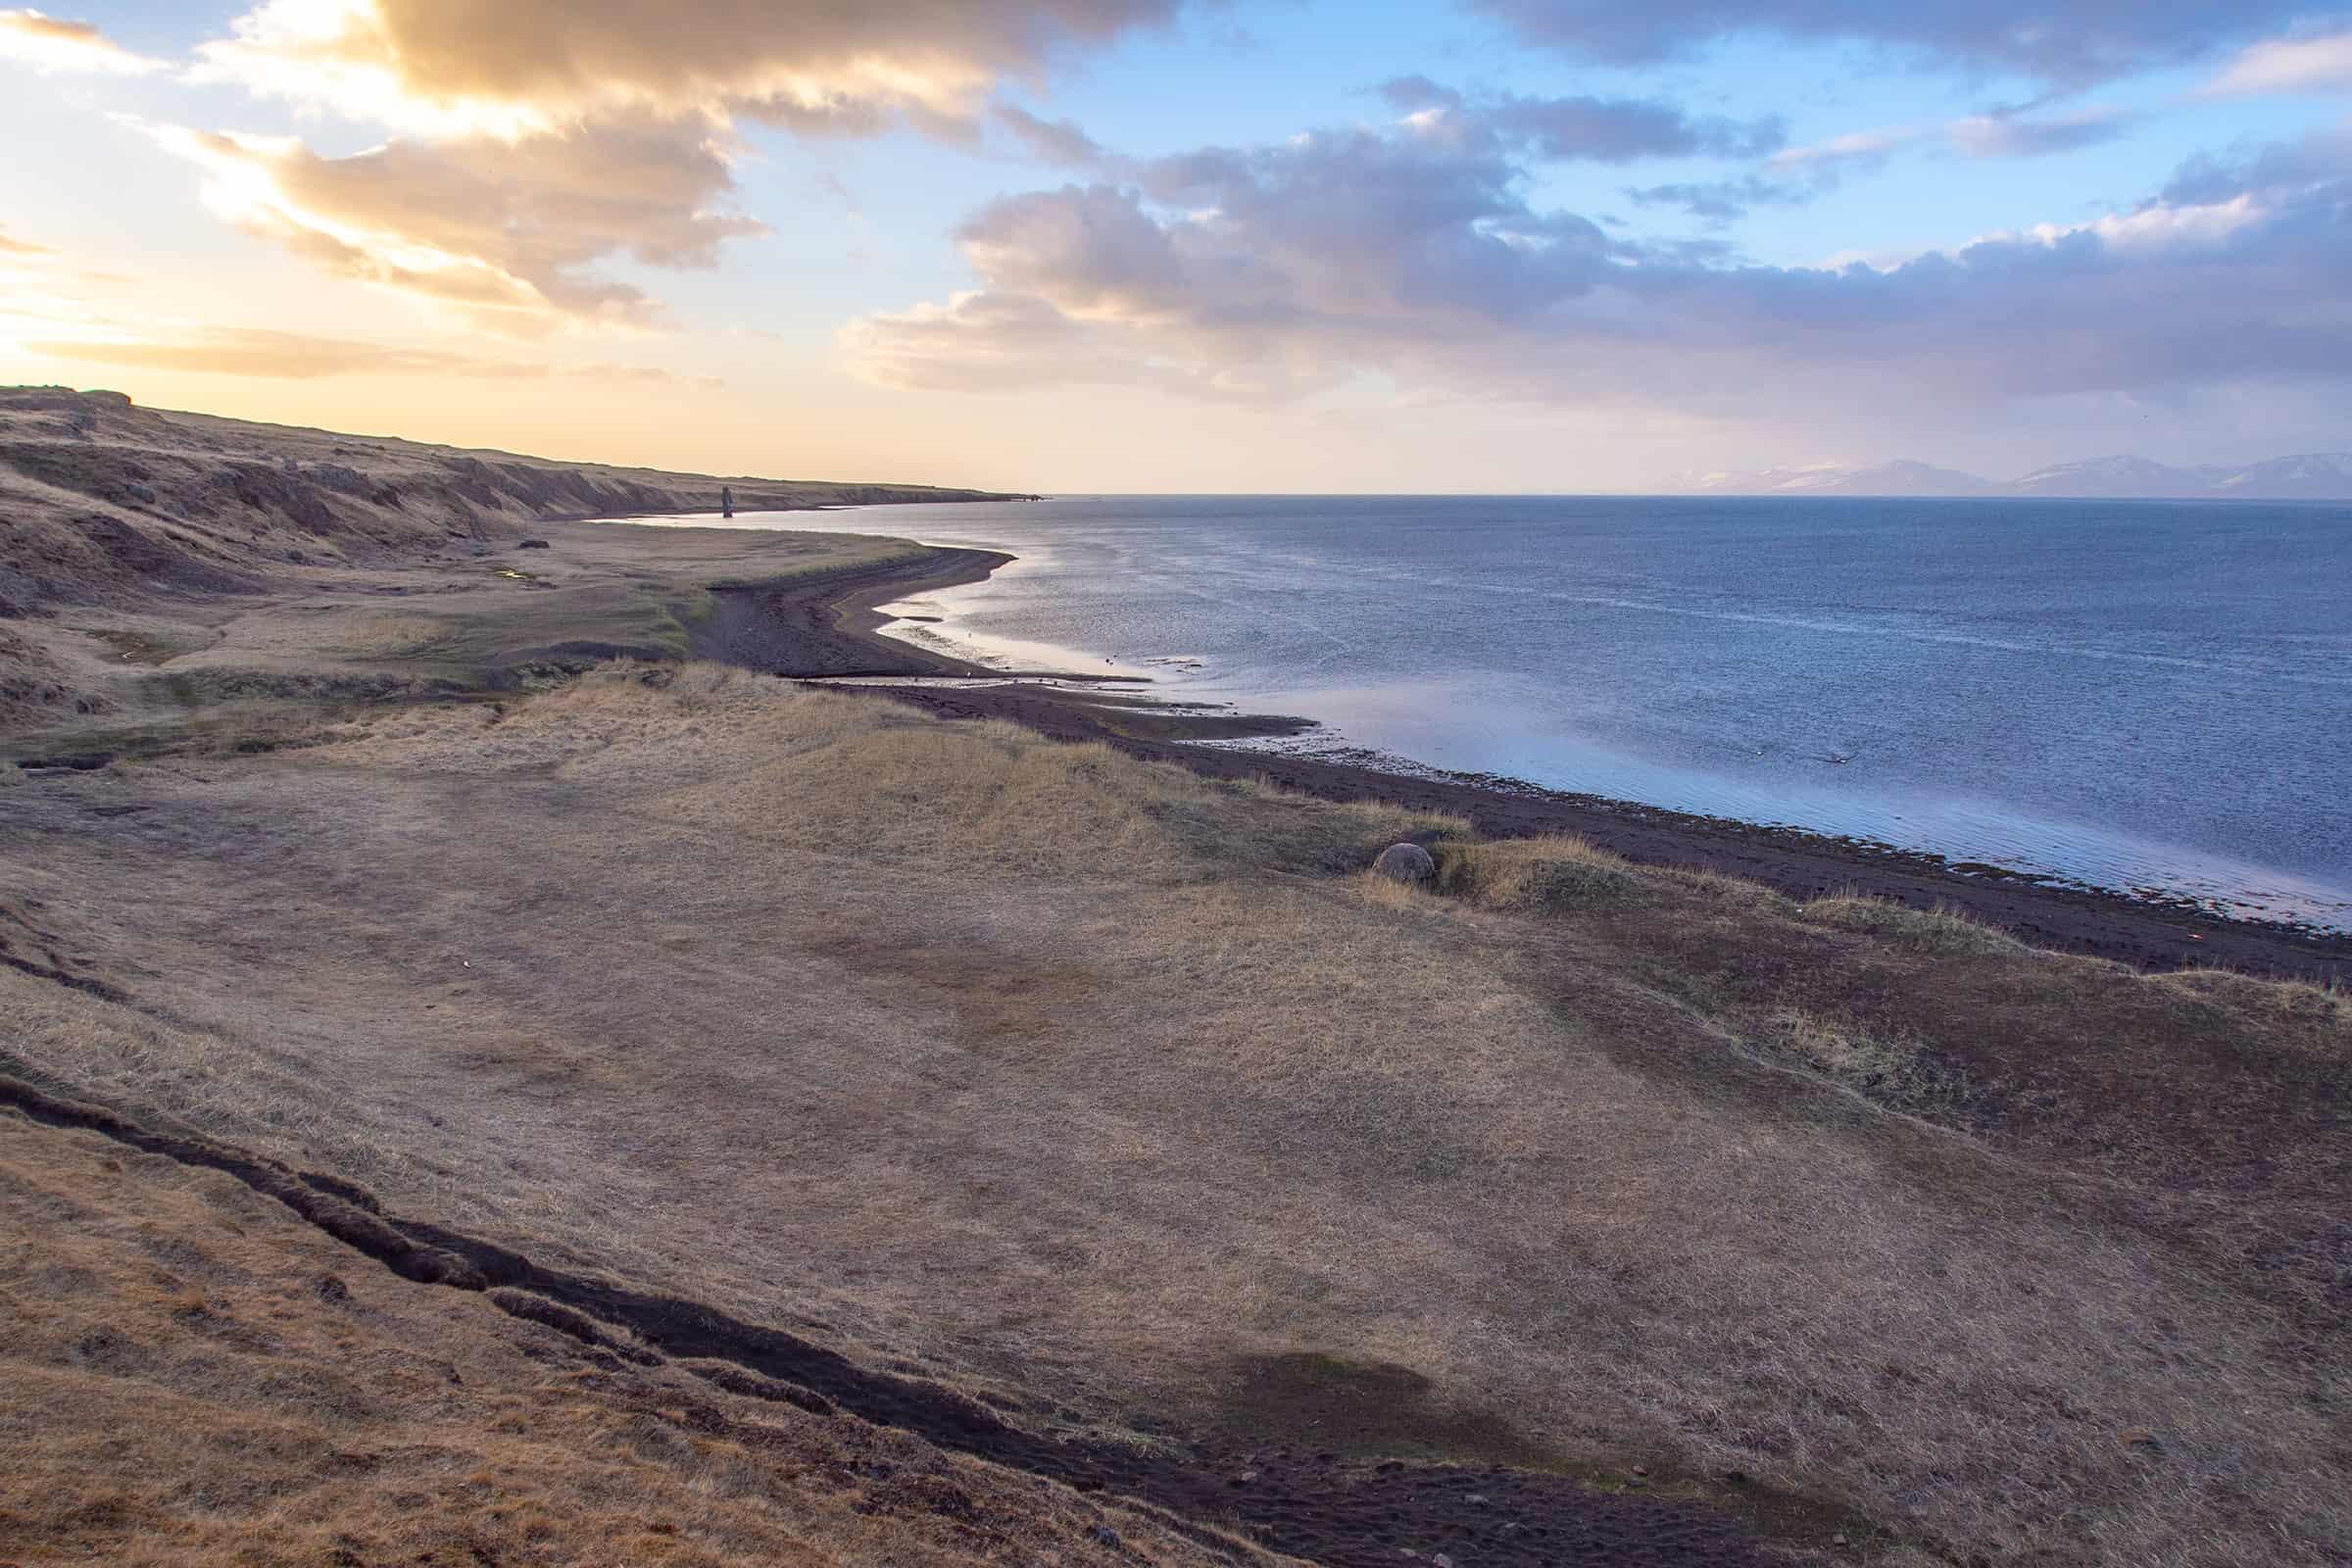 Schitterende stranden bij Hvítserkur